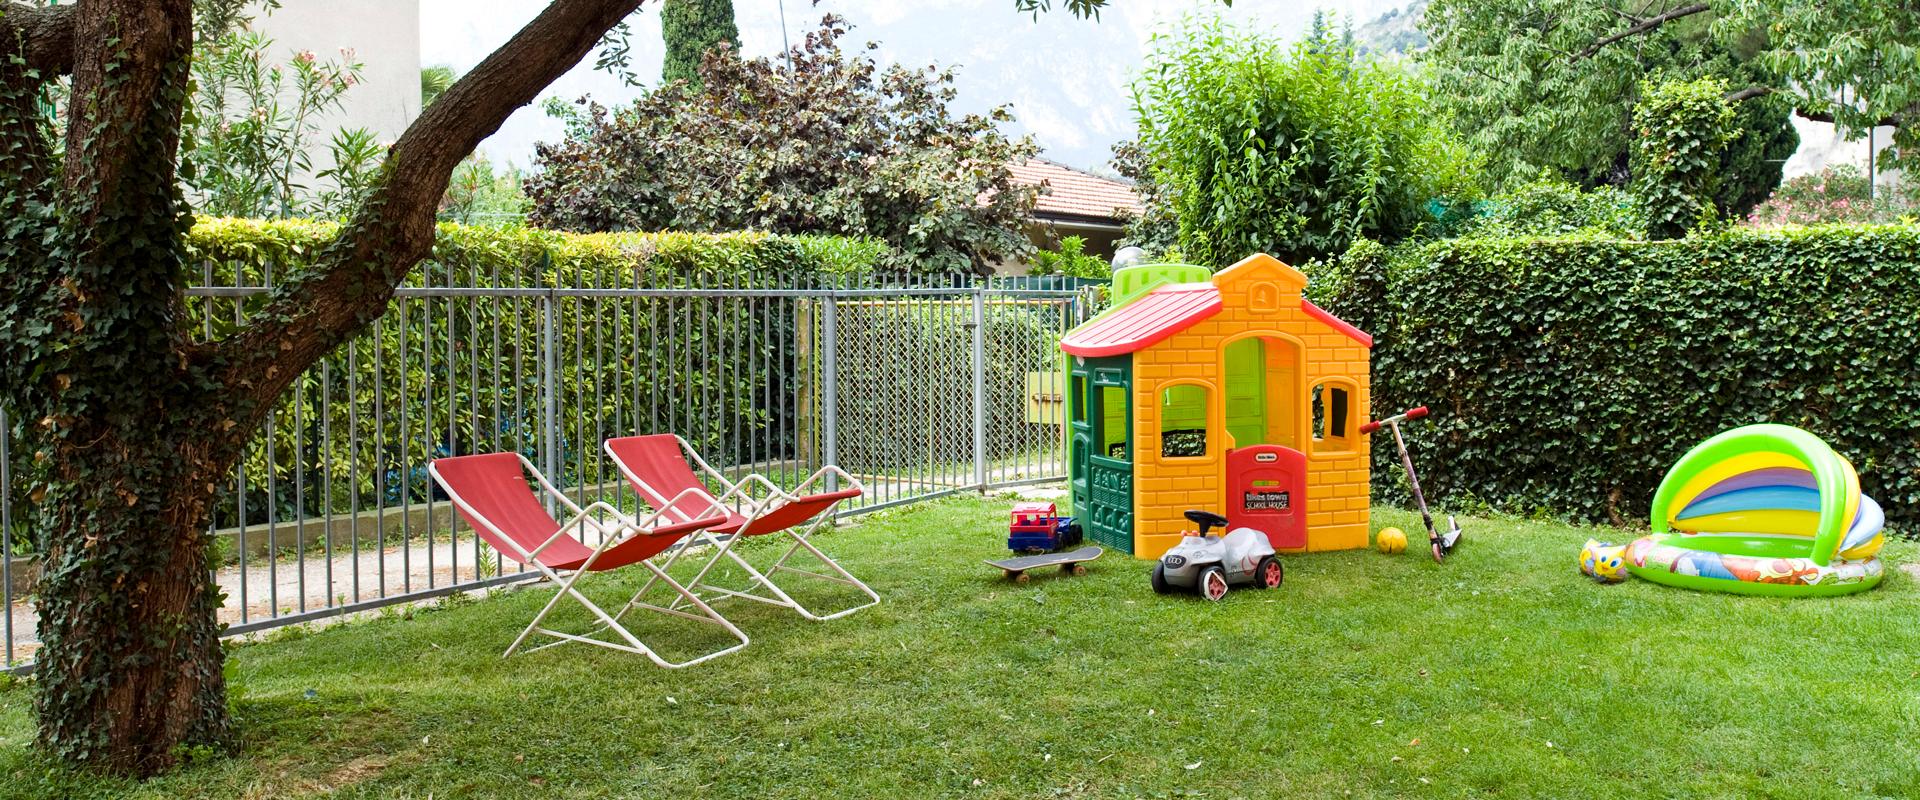 Villa Mimosa - B&B - Torbole sul Garda - Garden